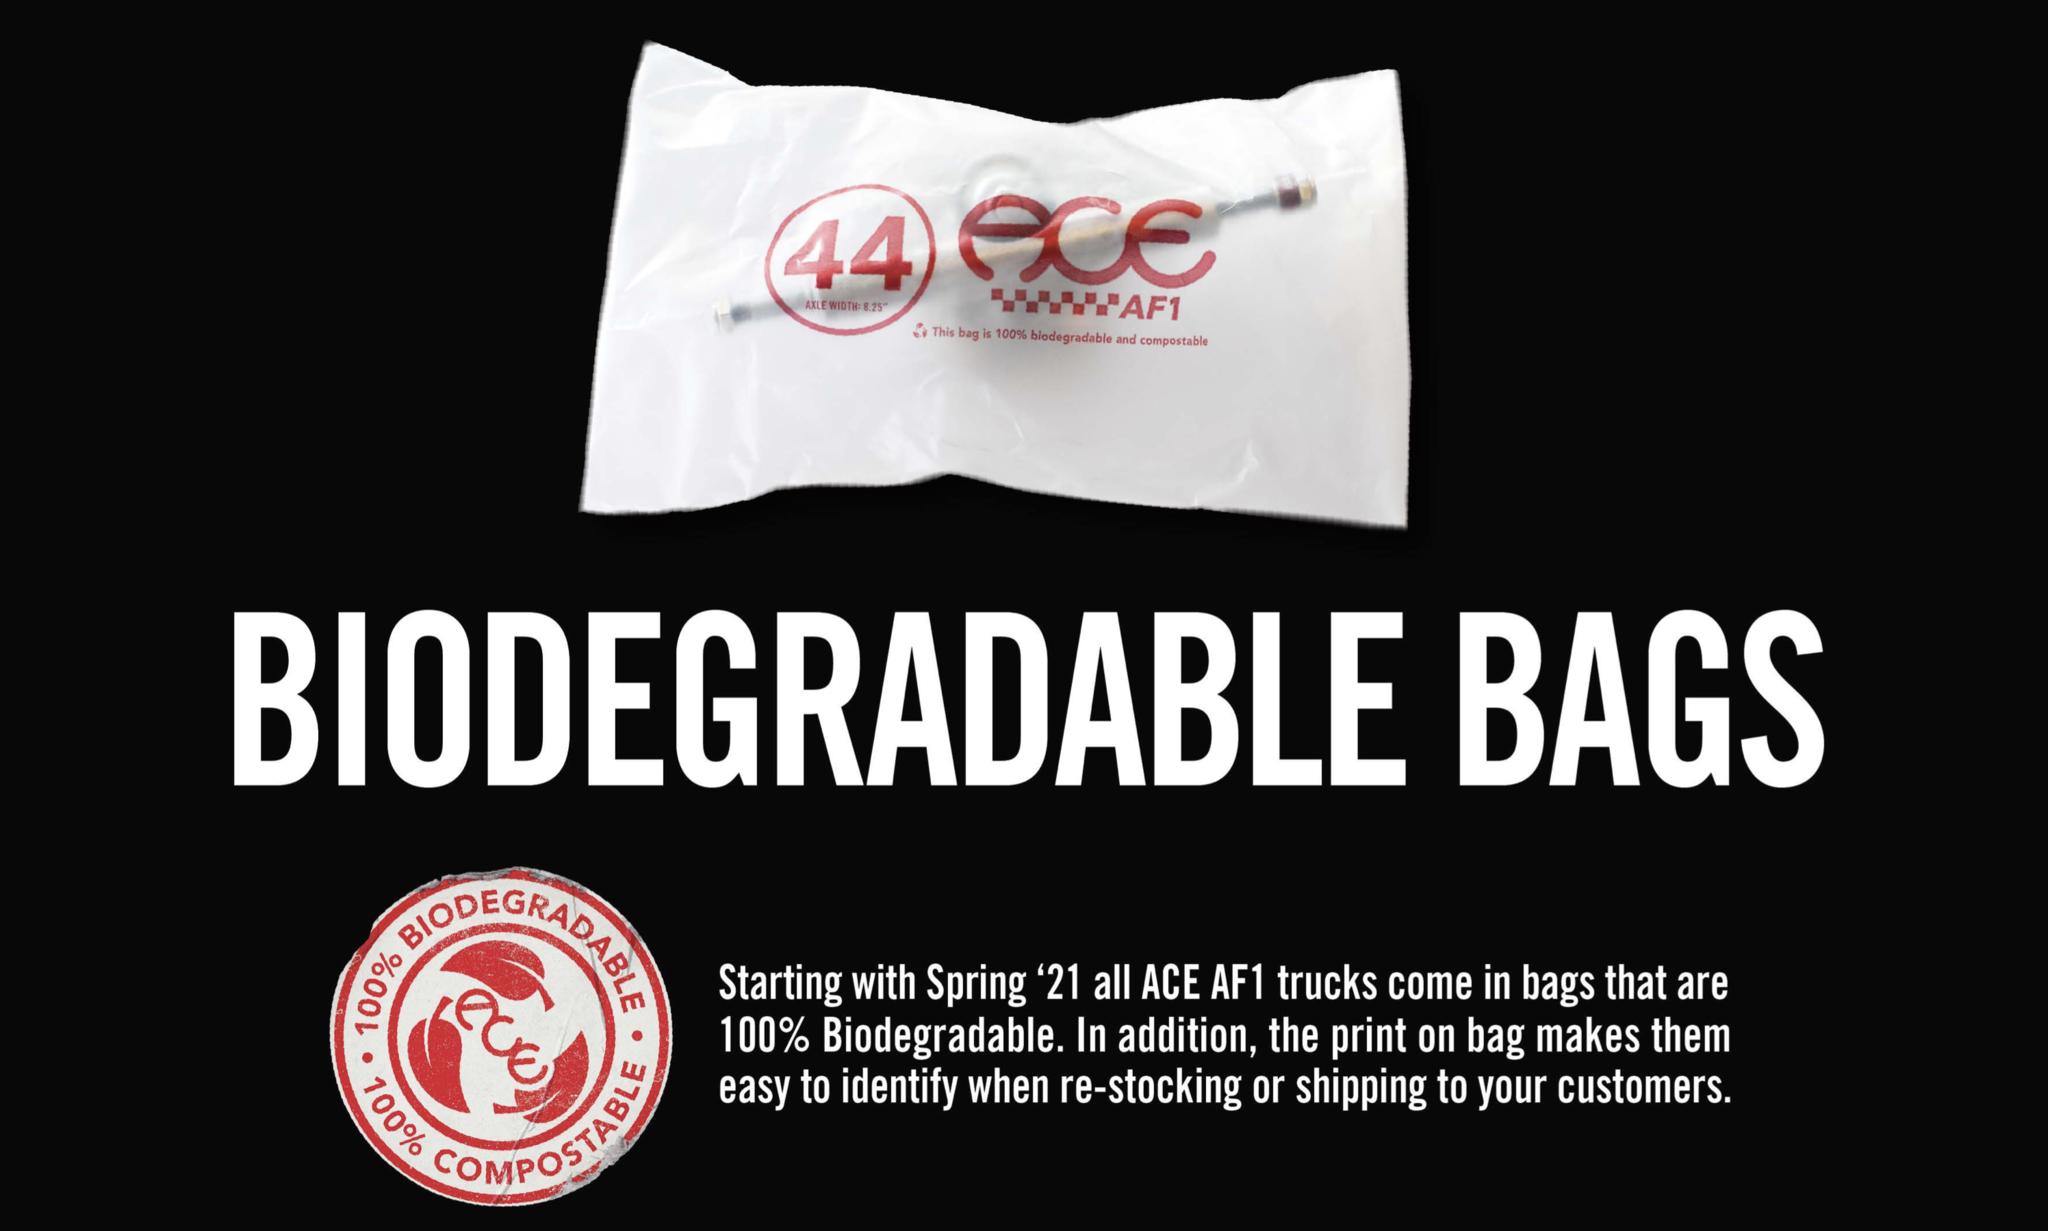 ace trucks reuasalbe bags